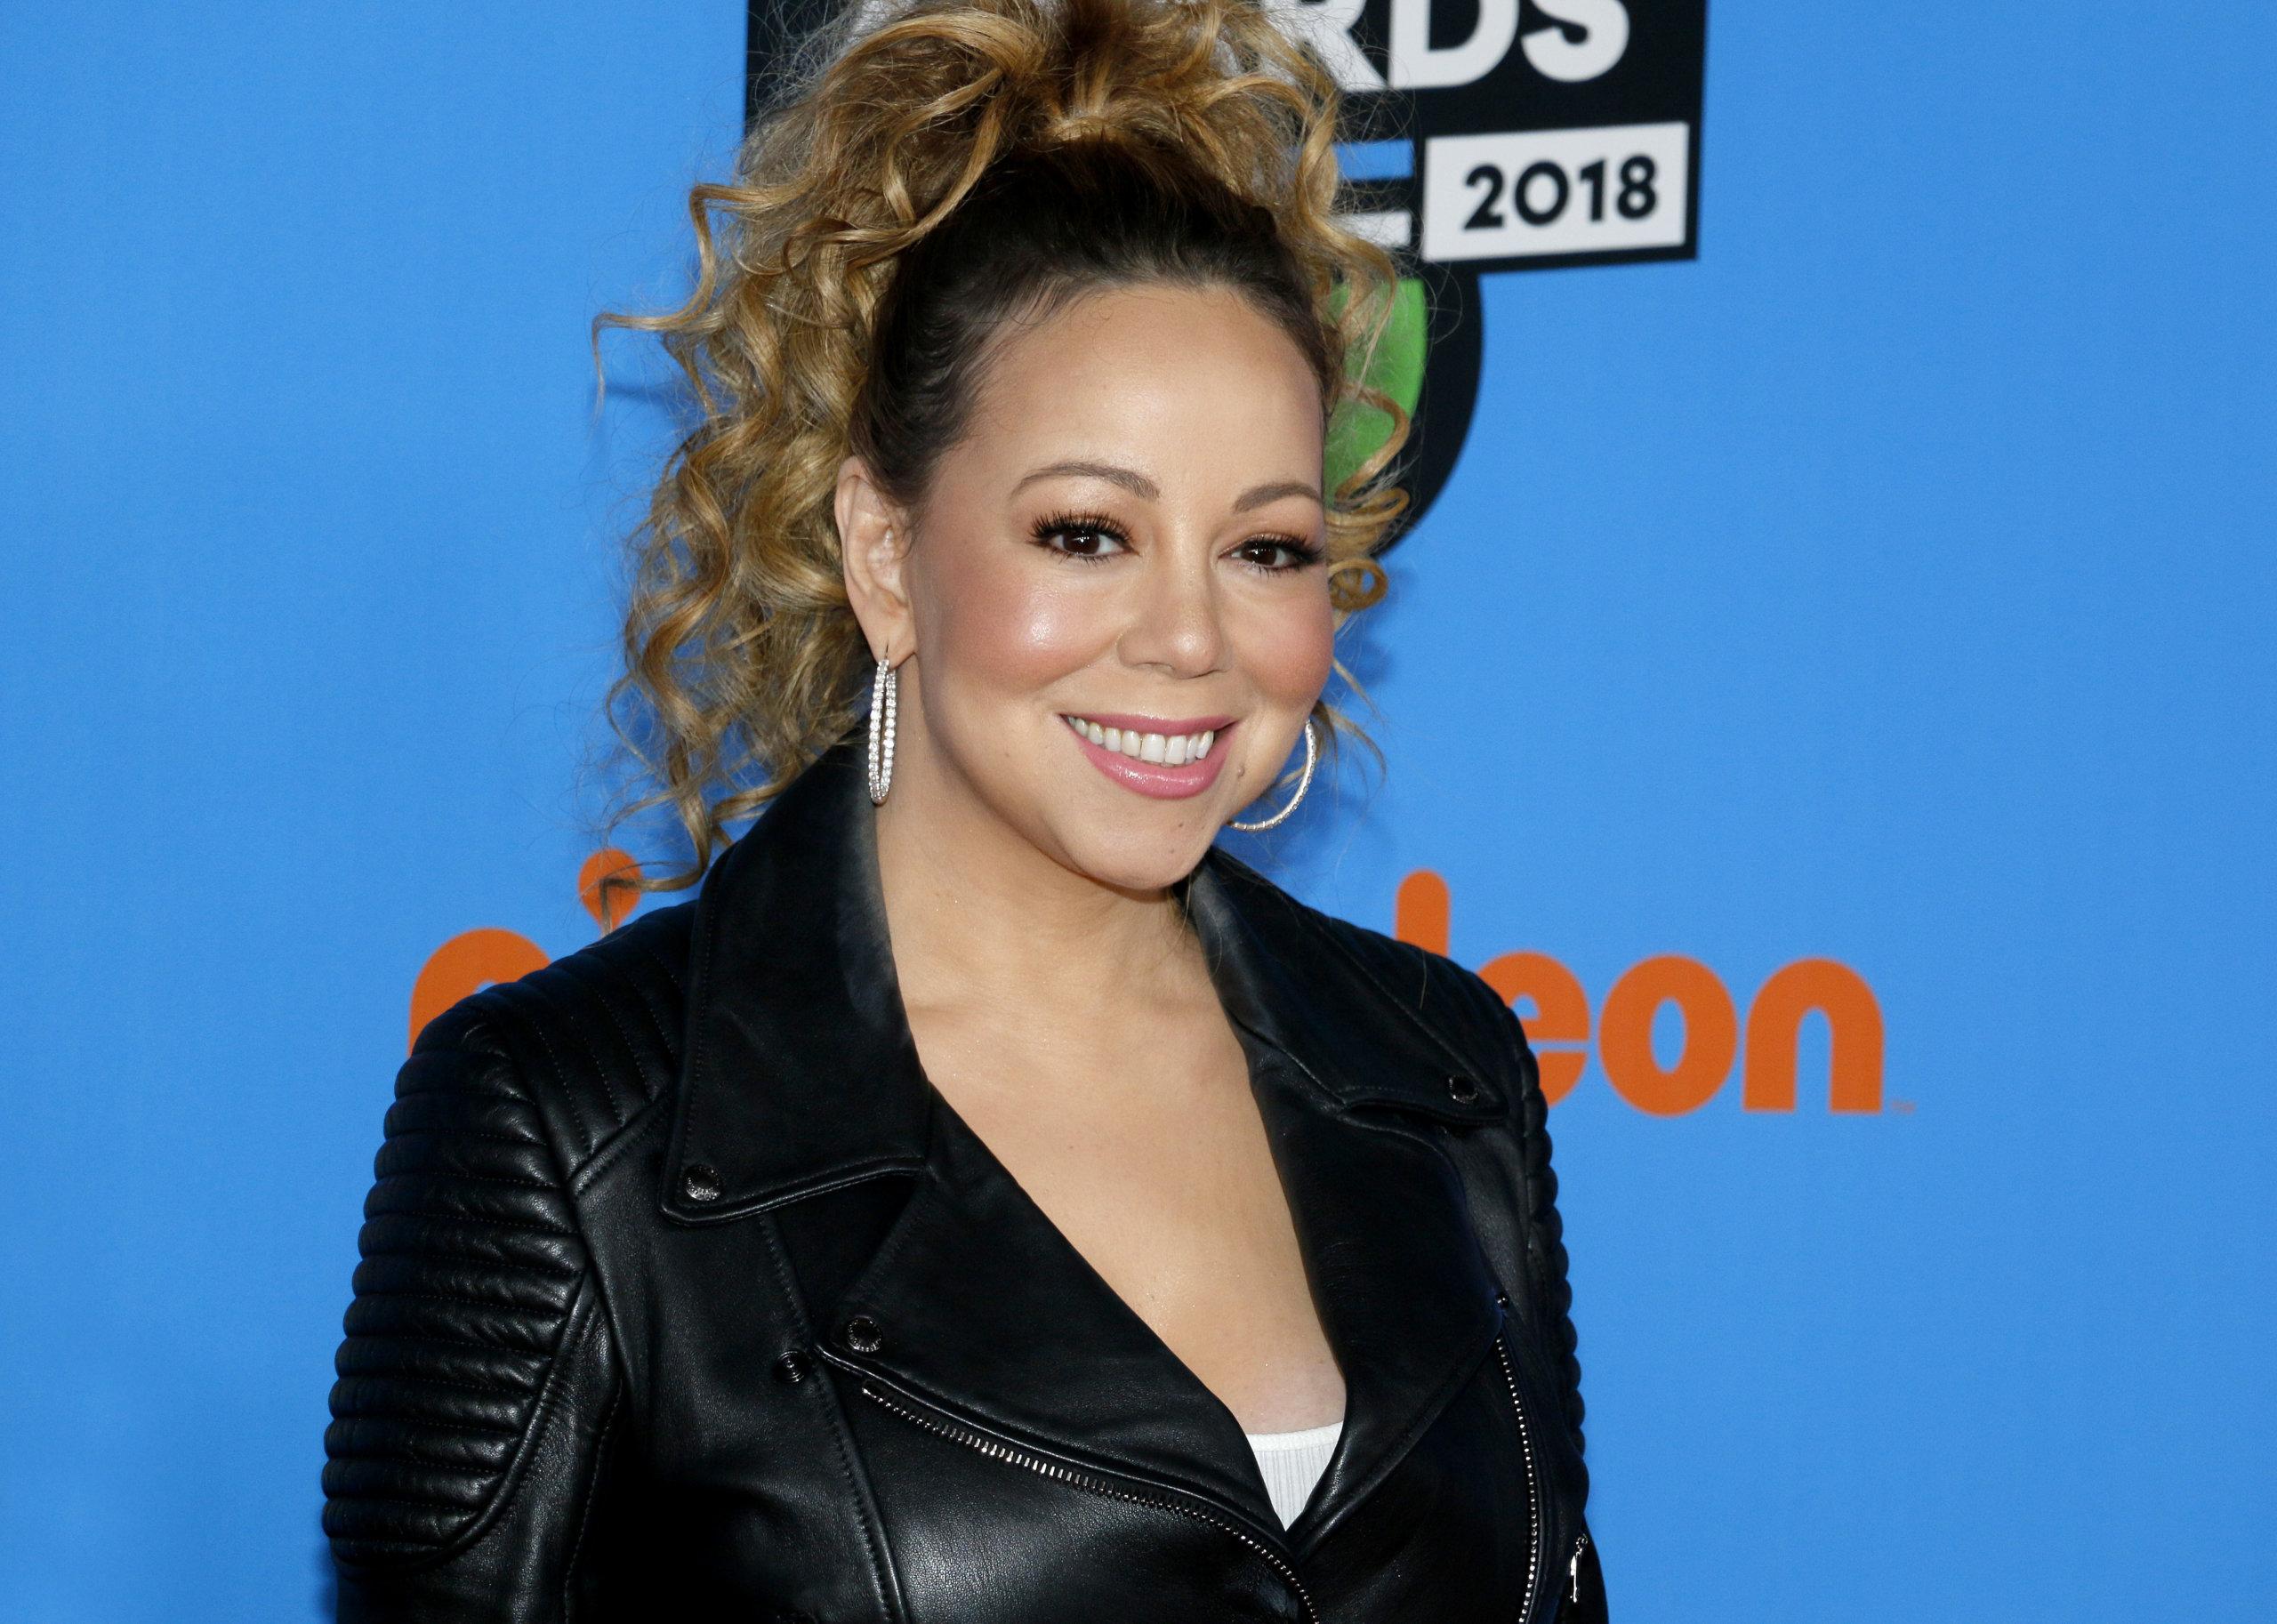 Mariah Carey at the Nickelodeon's 2018 Kids' Choice Awards